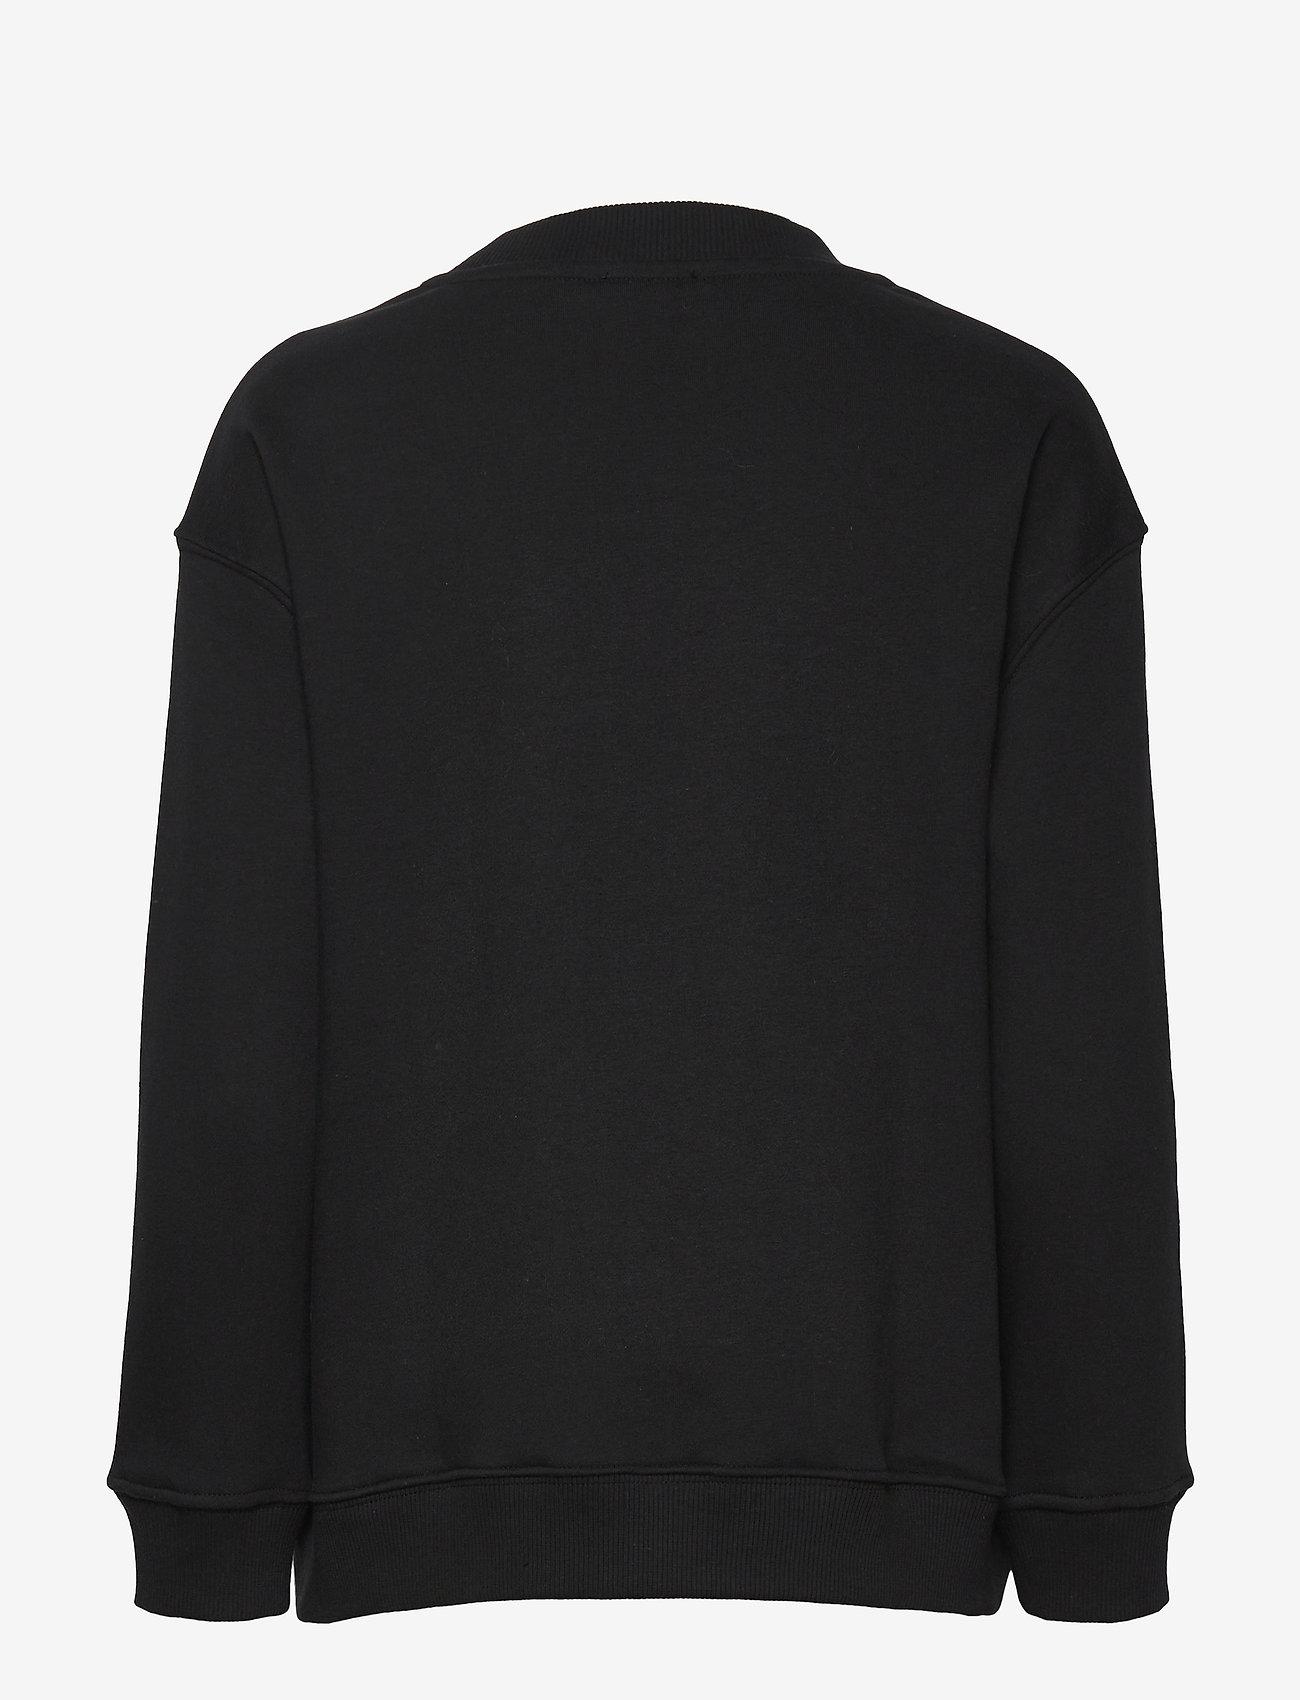 Baum und Pferdgarten - JAALA - sweatshirts - black - 1